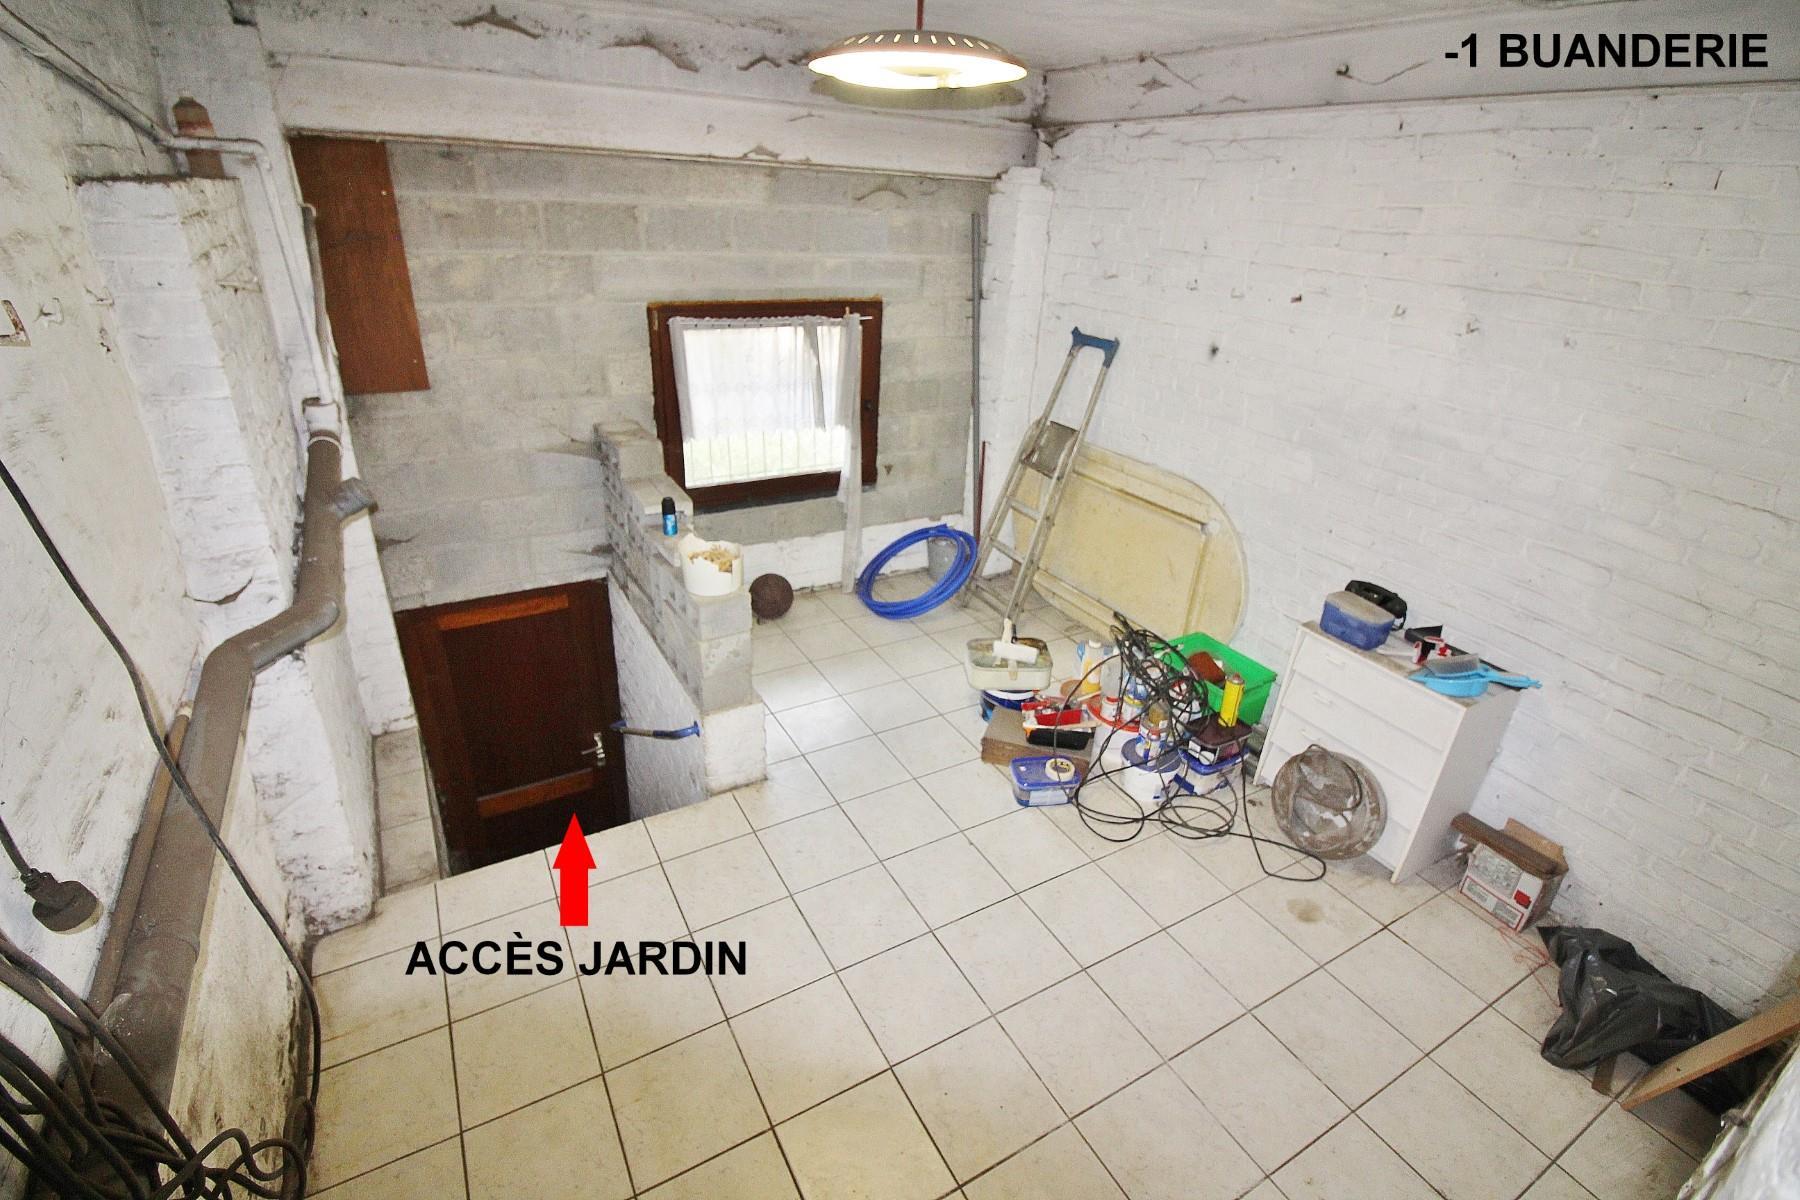 Maison - Seraing Jemeppesur-Meuse - #3539725-10